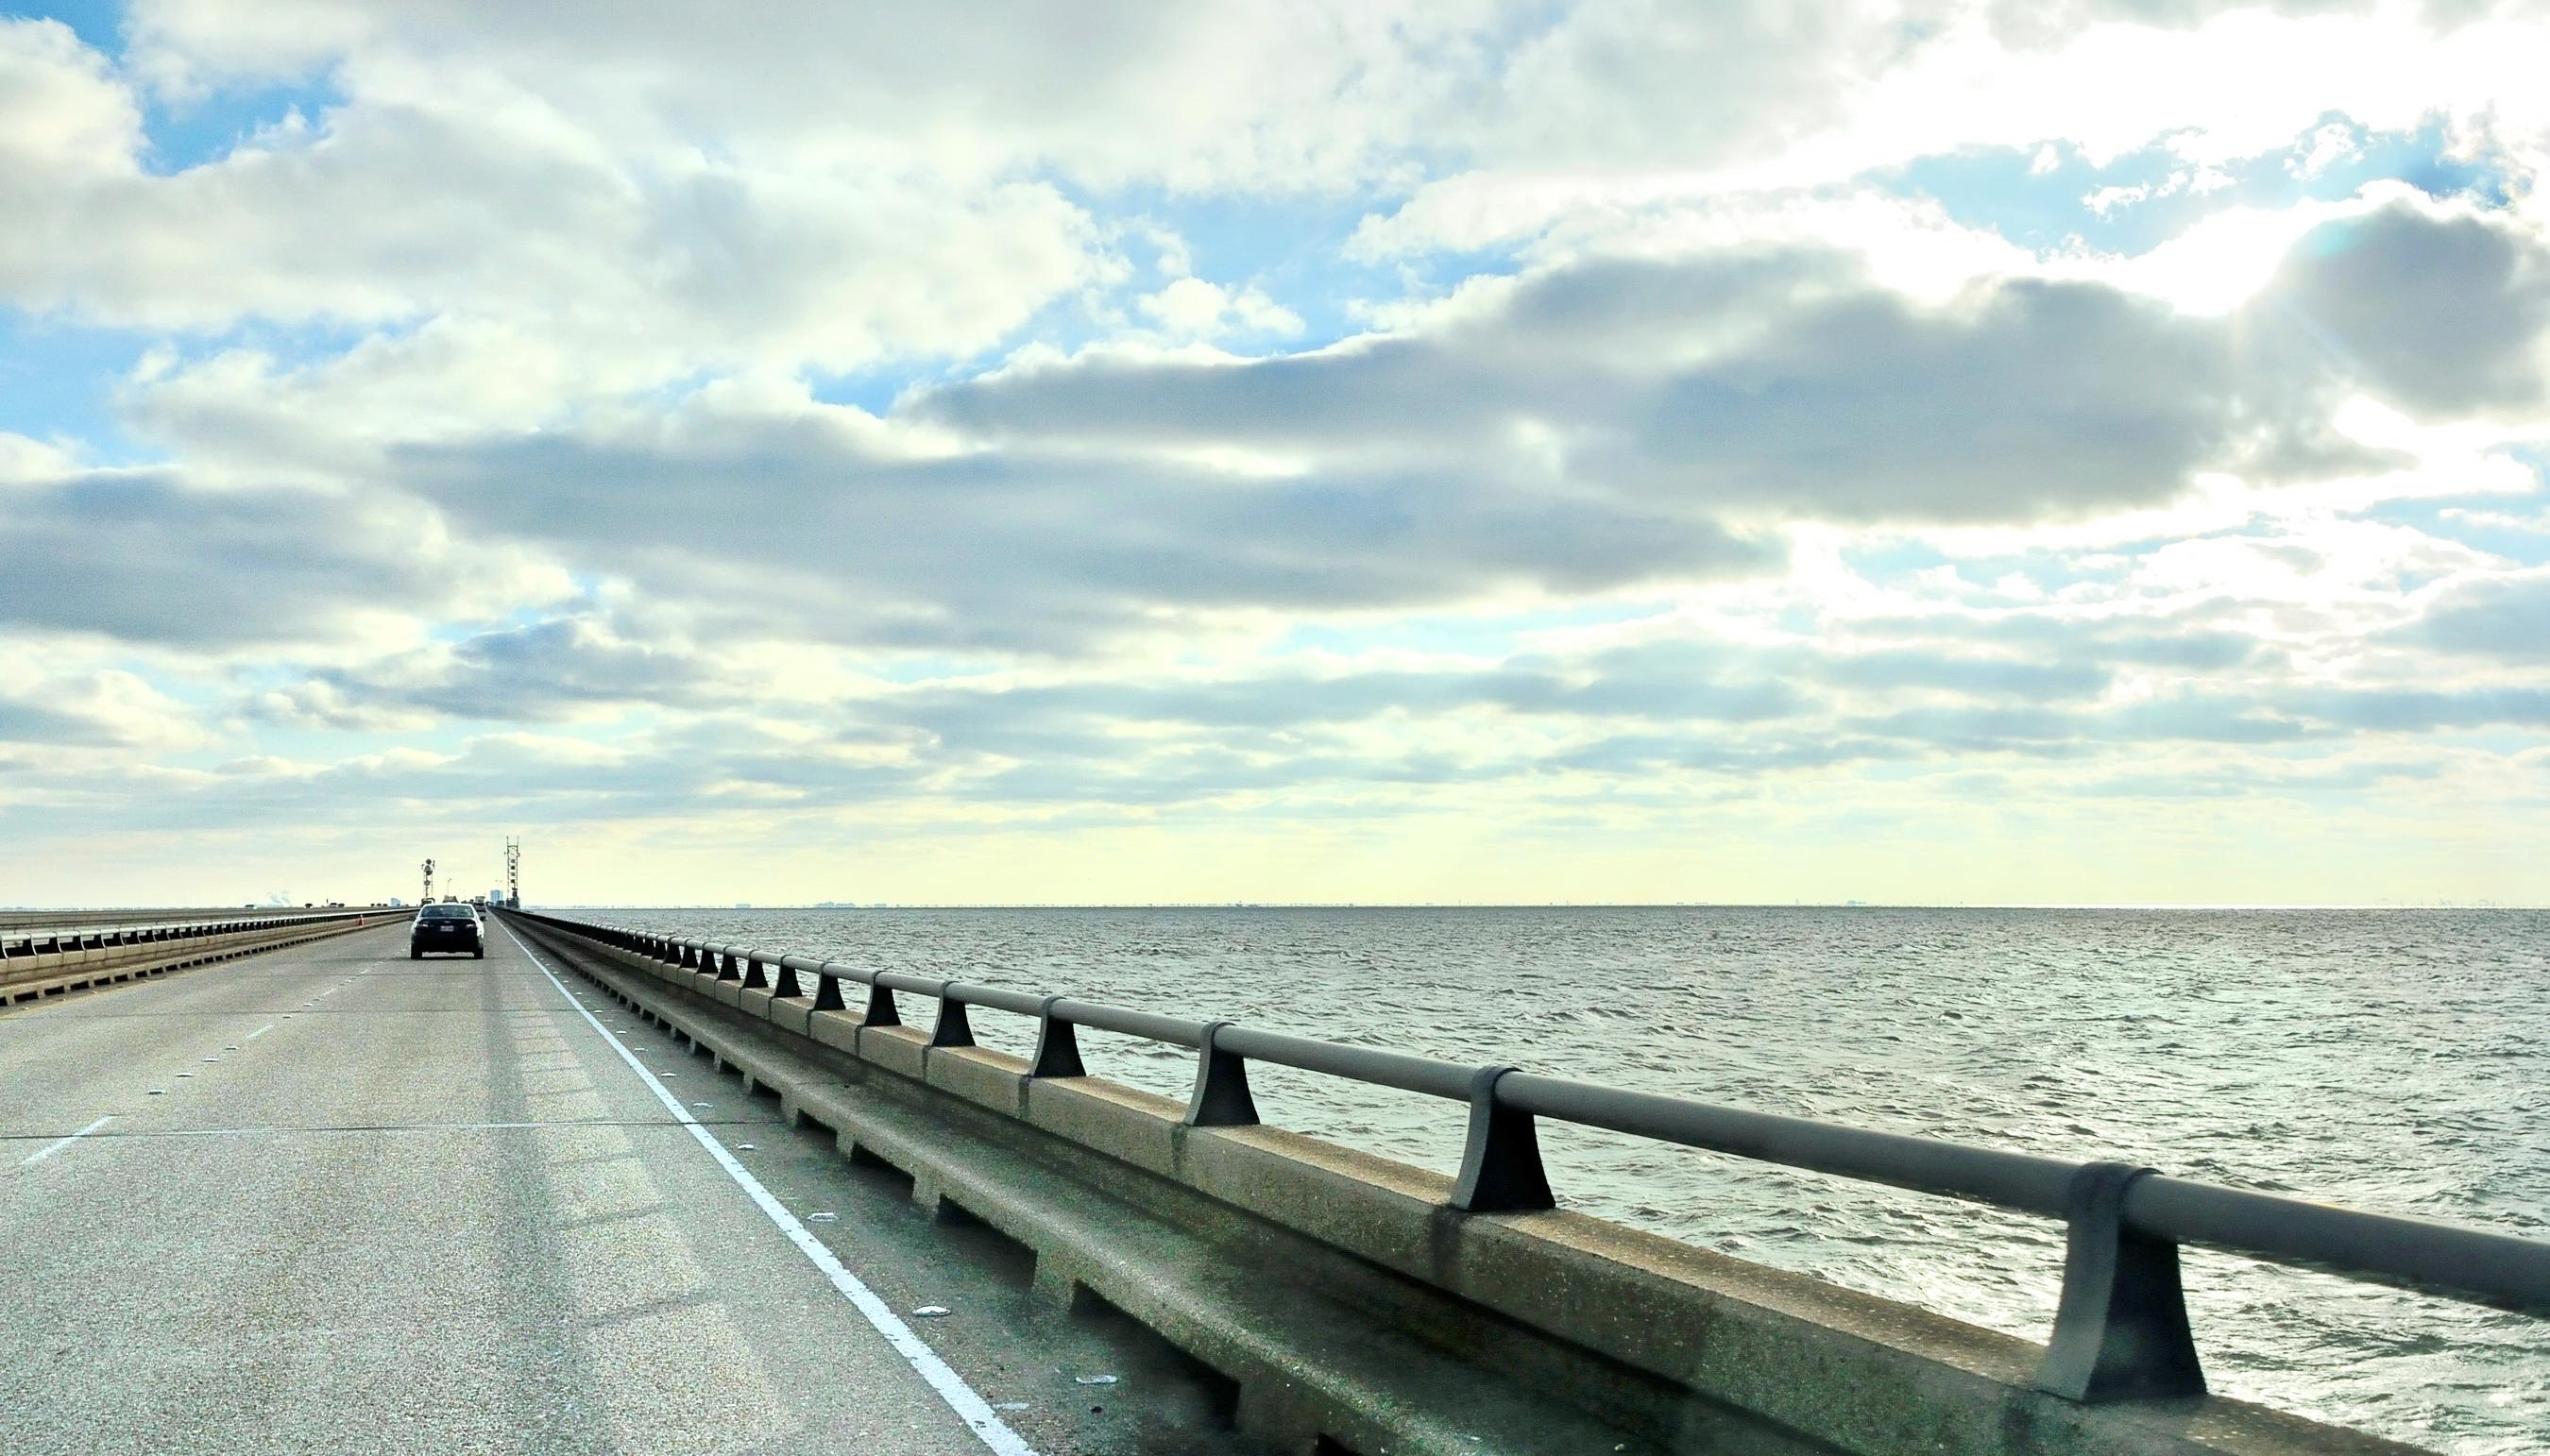 Lake Pontchartrain Causeway